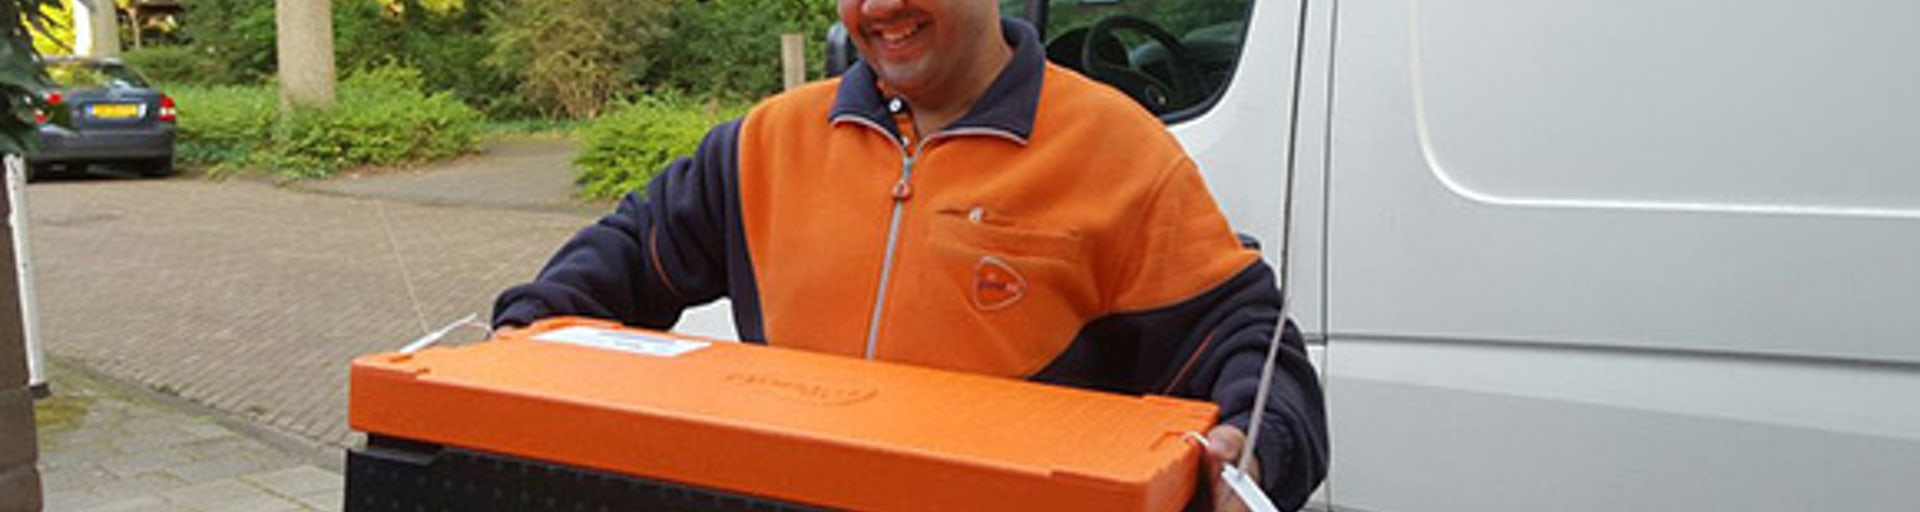 Postnl breidt foodbezorging verder uit tcm10 90728